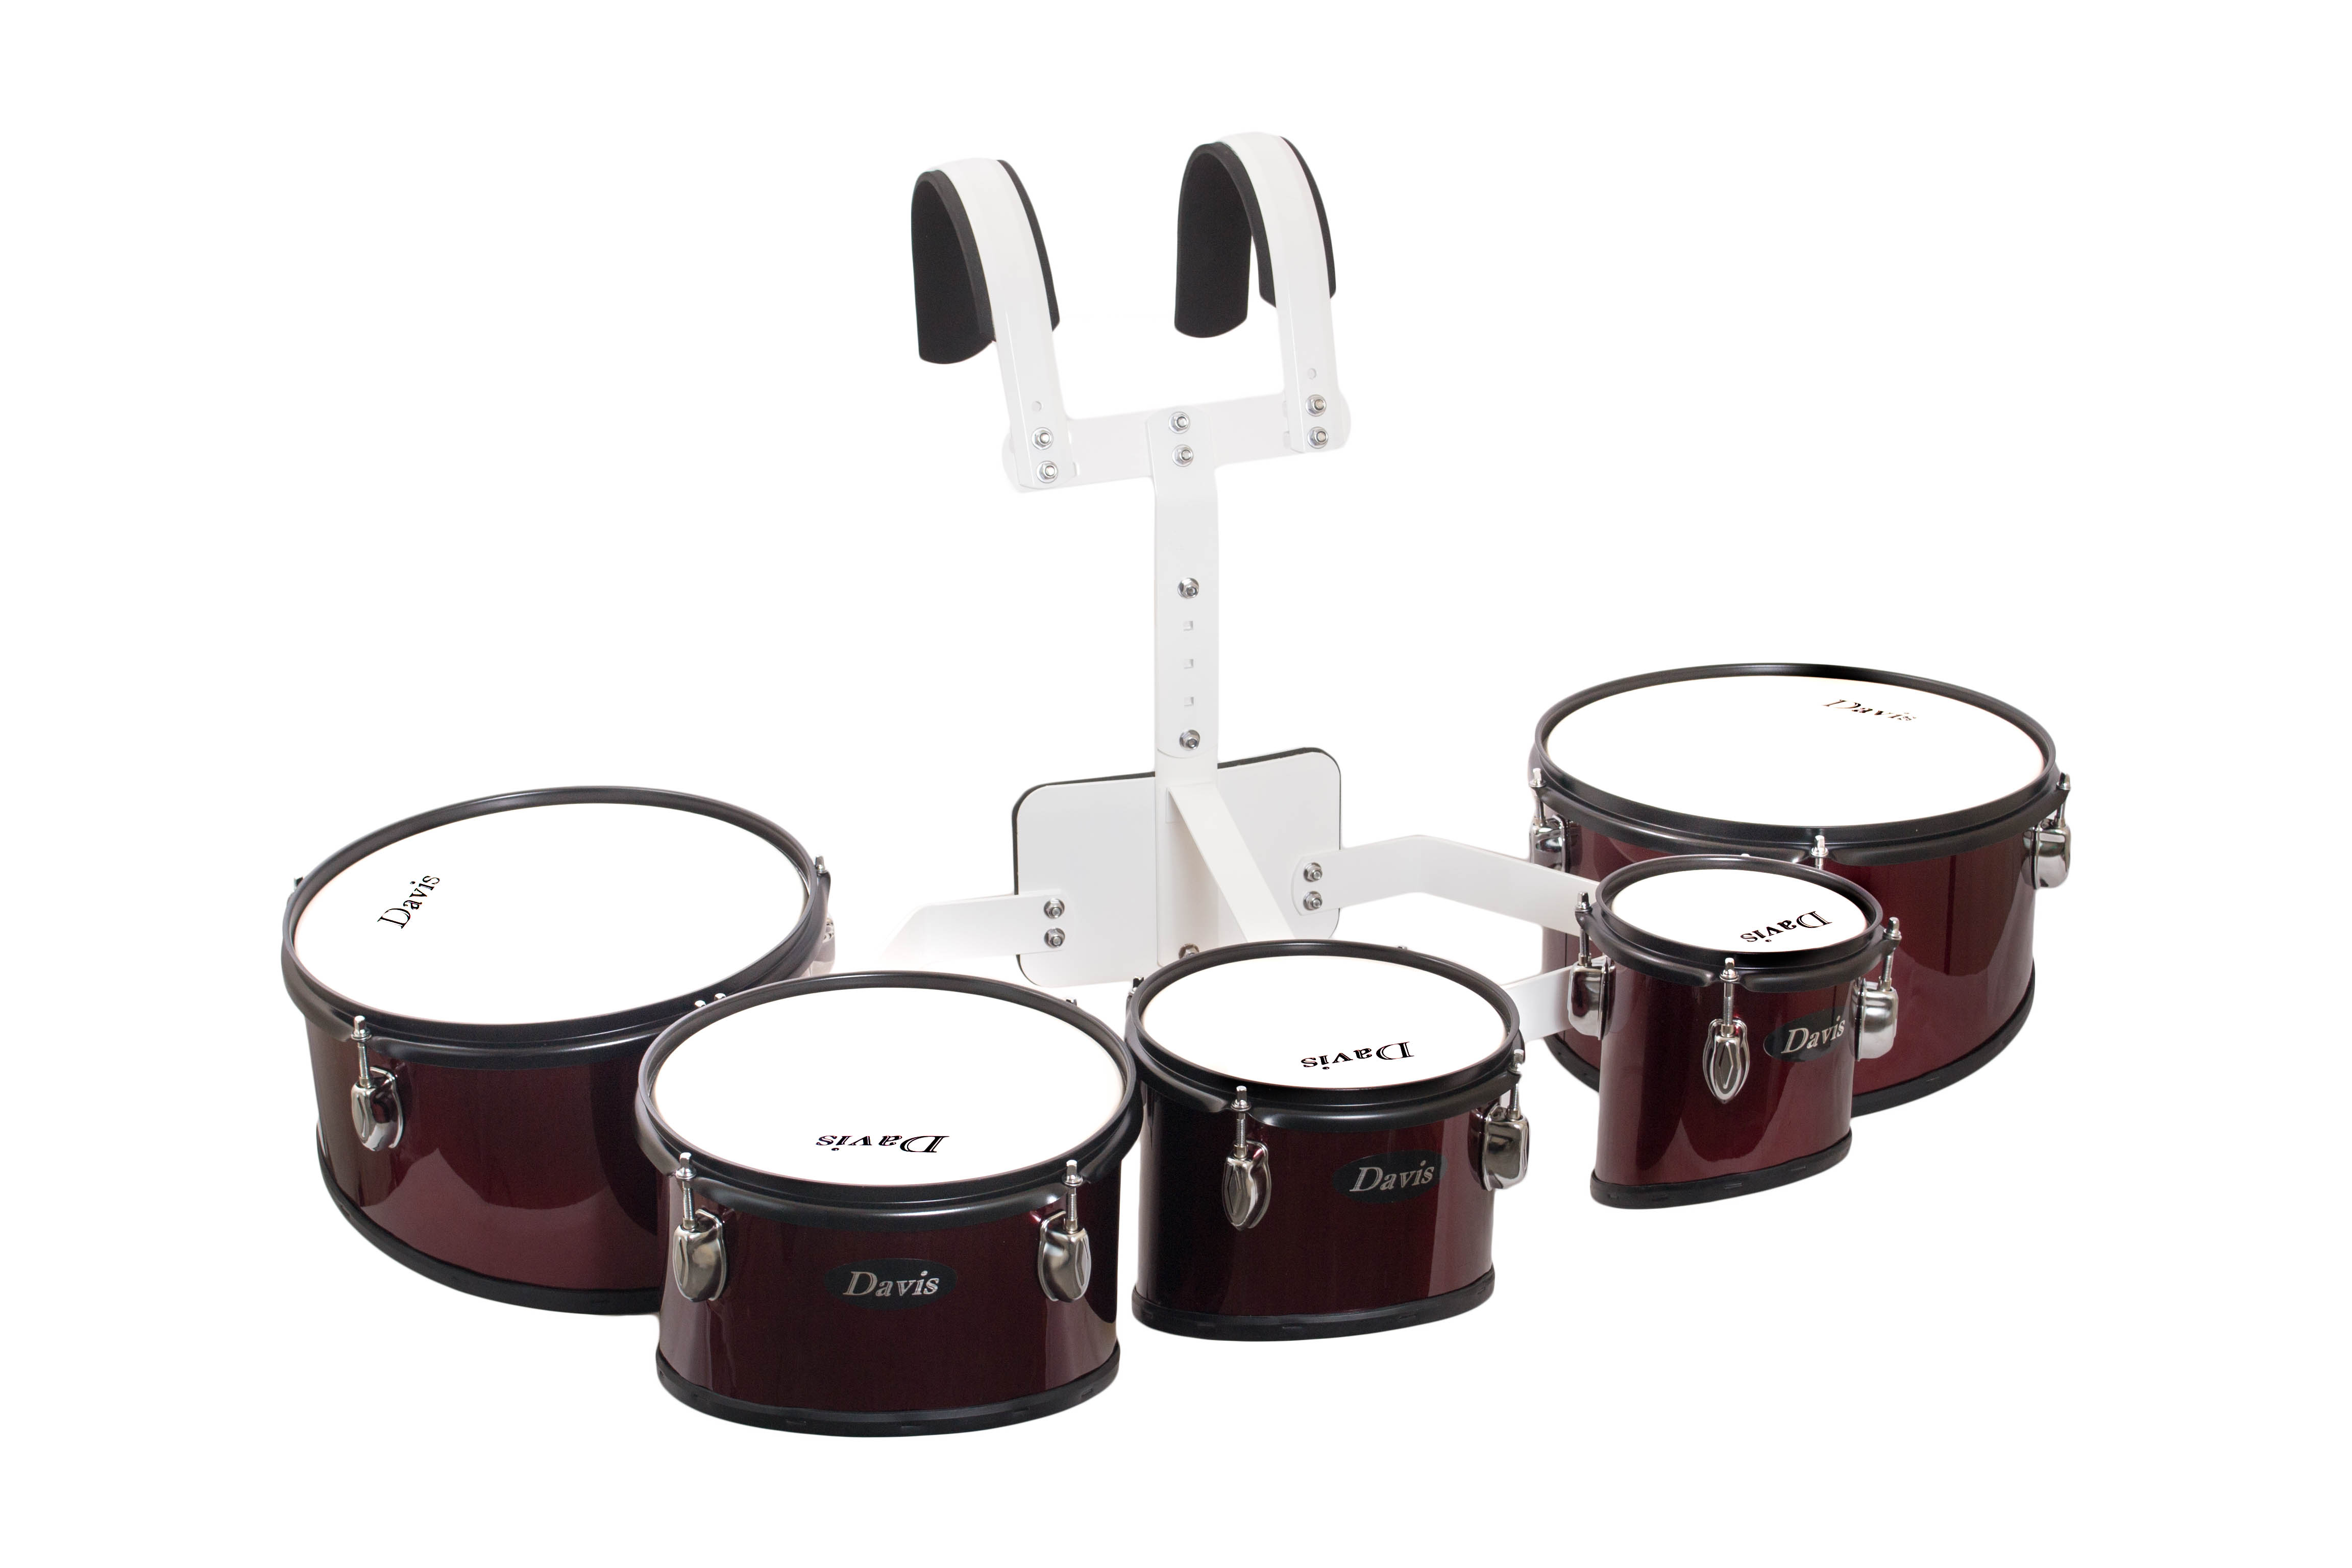 Davis Musical Instruments-Penta 6,8,10,12,13-WRD_0